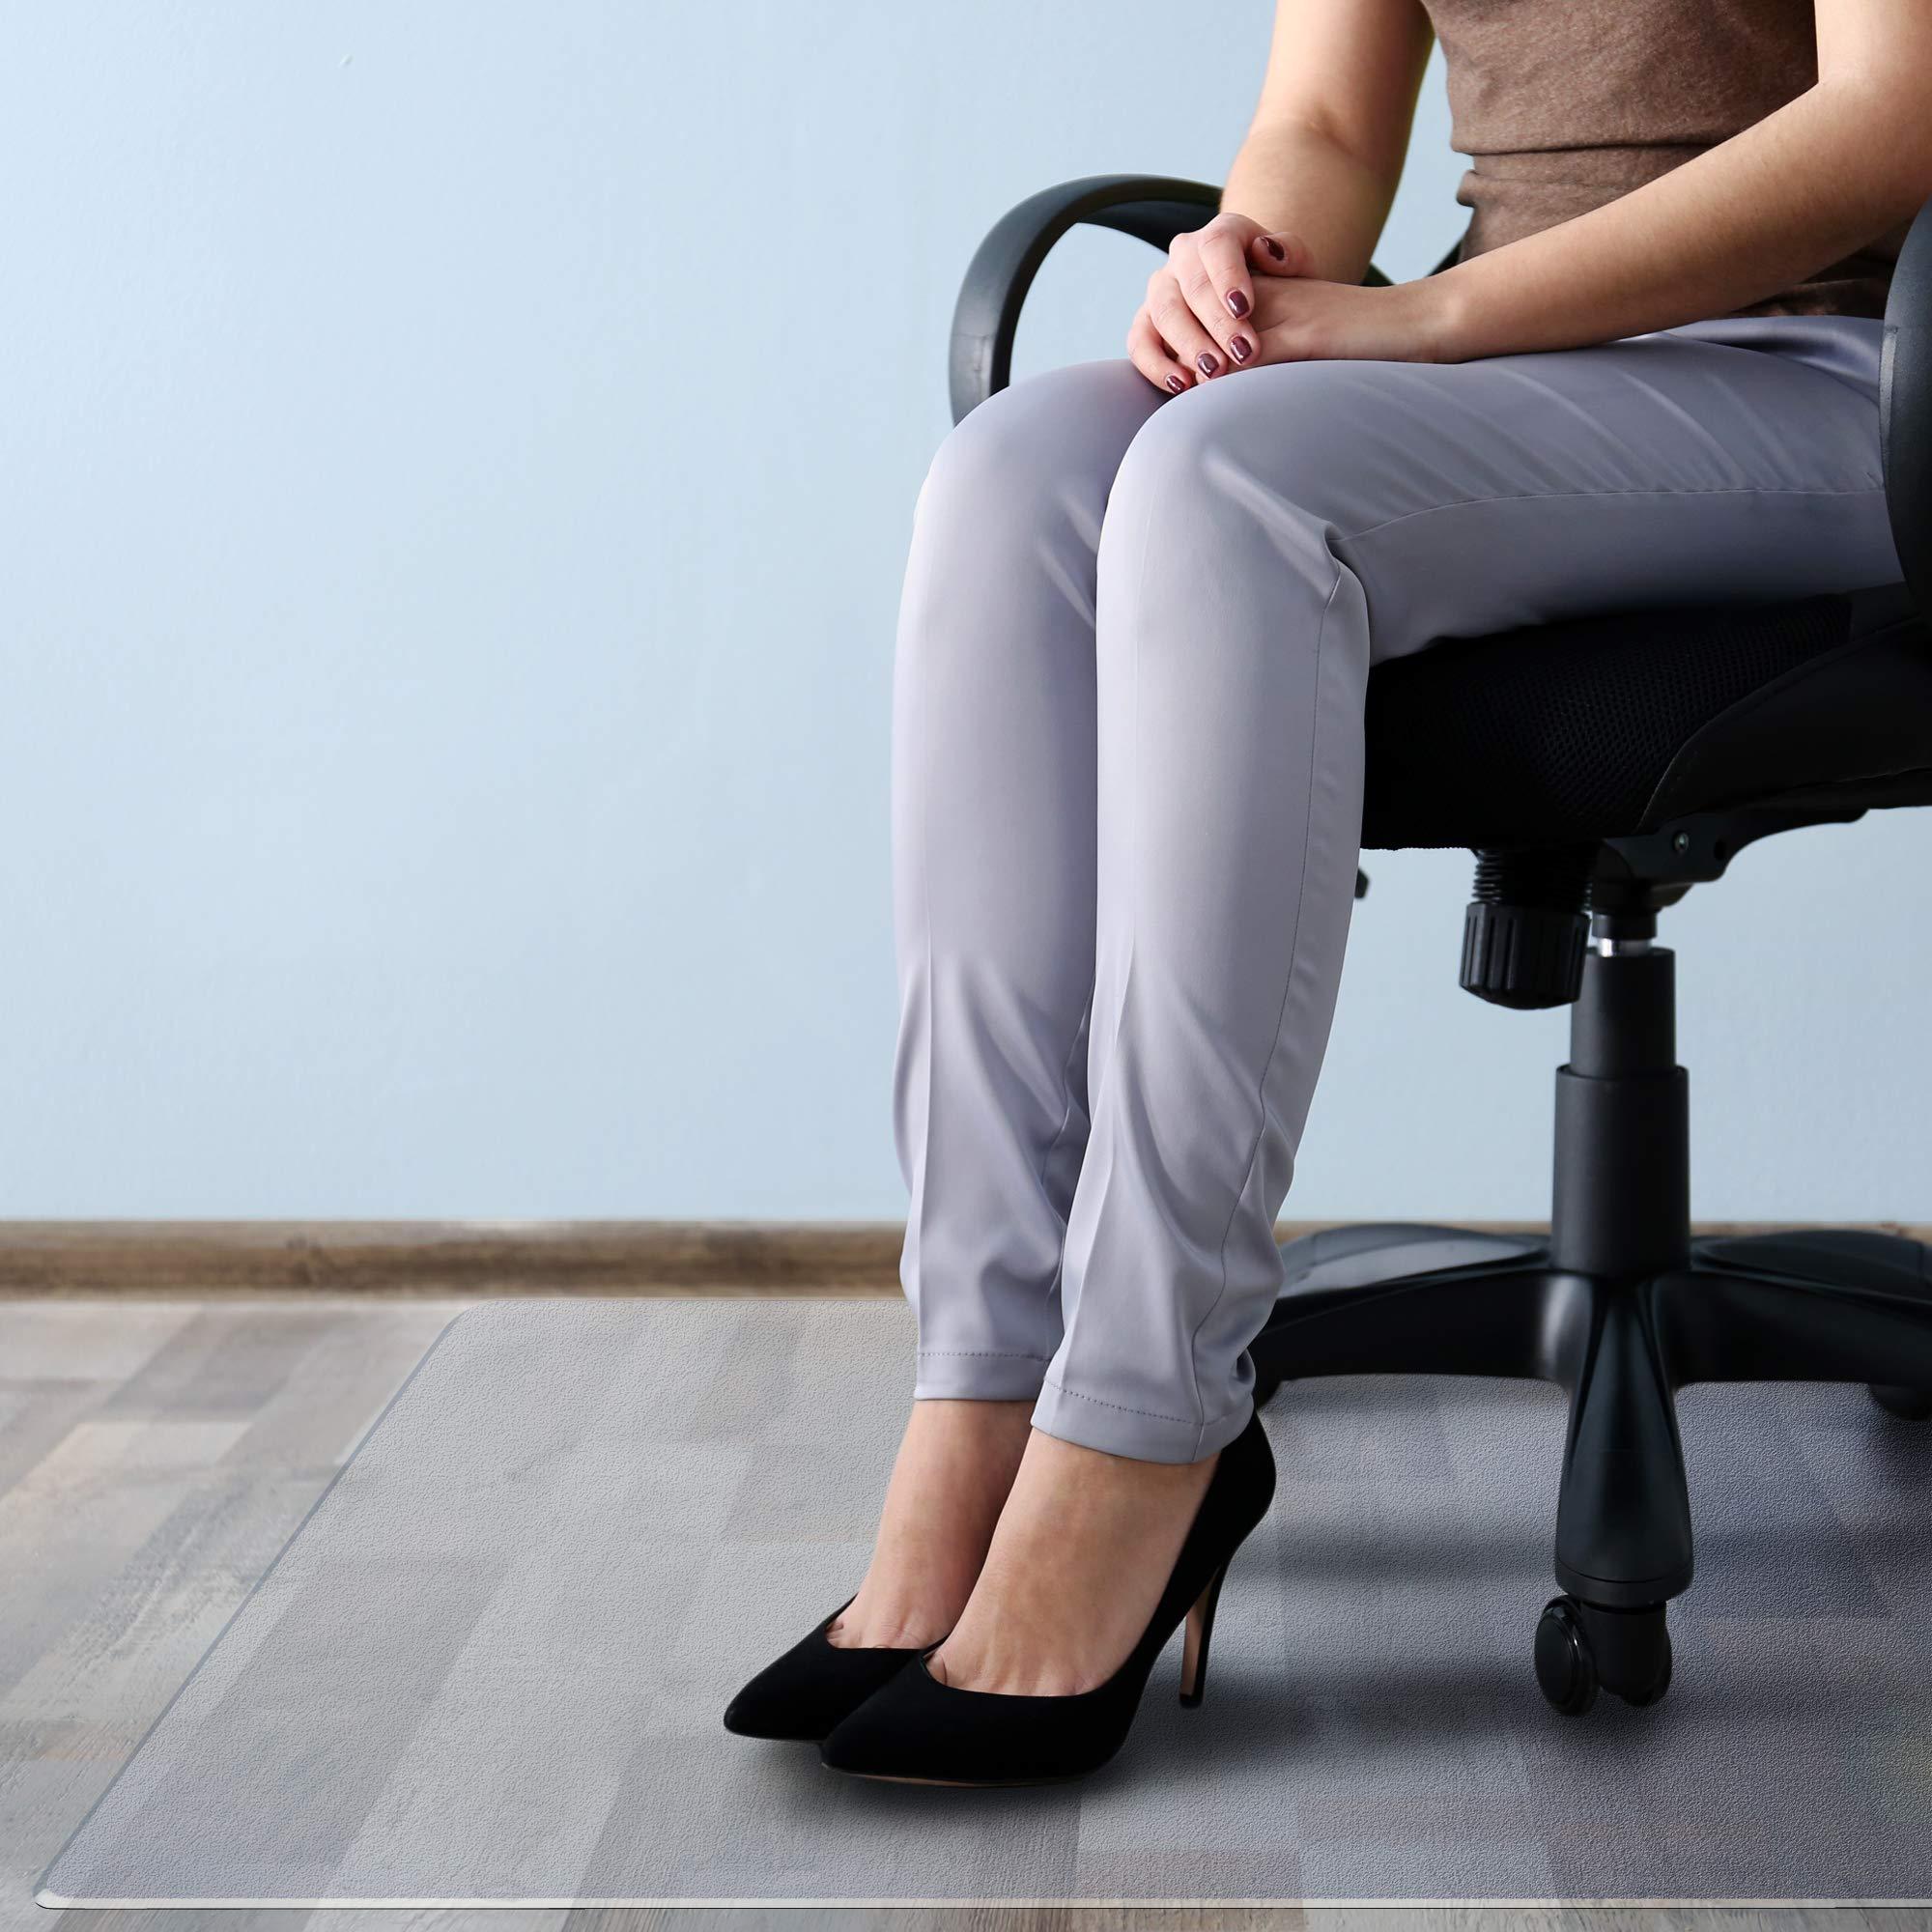 Floortex Cleartex MegaMat Heavy-Duty Polycarbonate Chair Mat for Hard Floors and Carpets, 46'' x 60'', Clear (FCM121525ER)